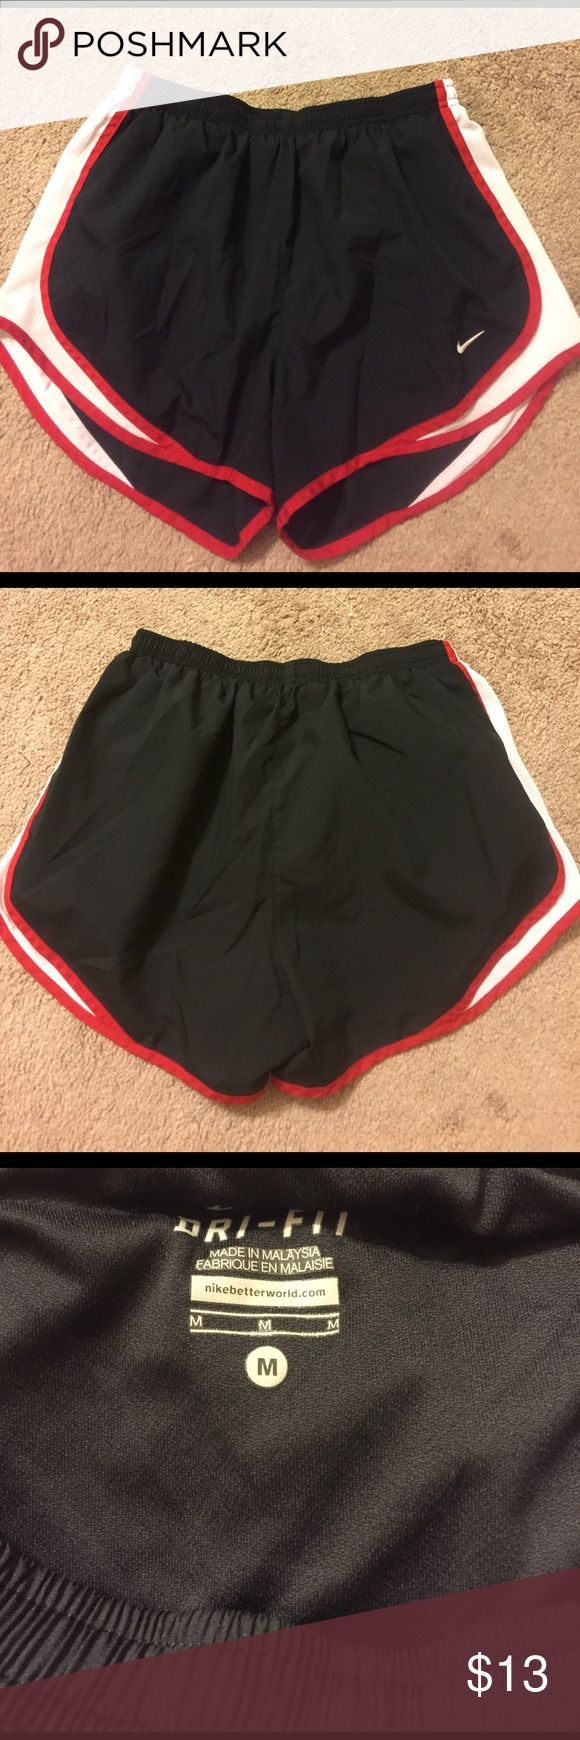 Women's Nike Tempo Running Shorts-Med Black with red and white trim running shorts. Nike Tempo. Size medium. Pet and smoke free home.  Nike Shorts